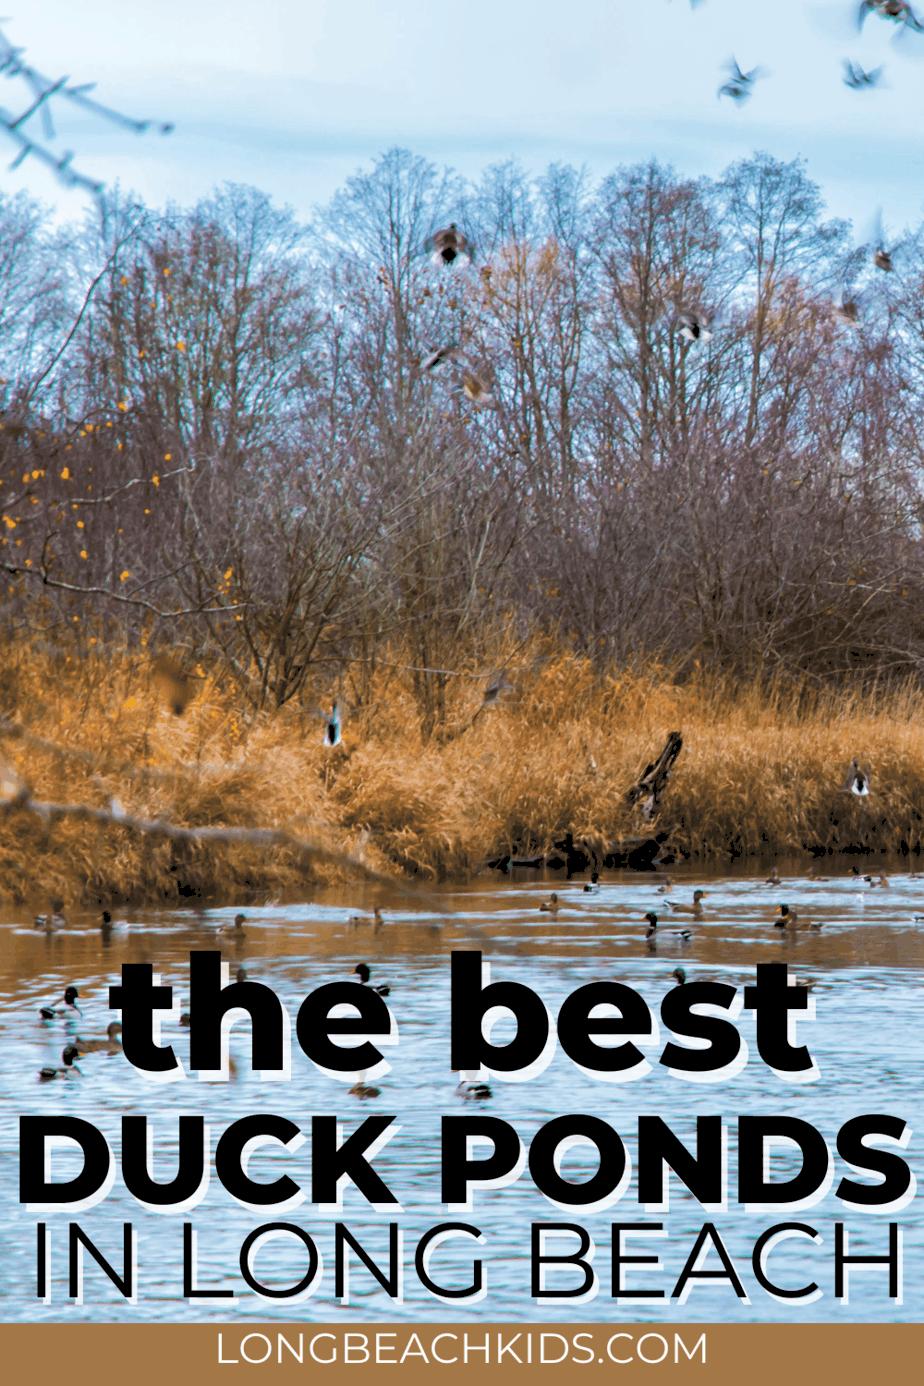 duck pond; text: best duck ponds in long beach